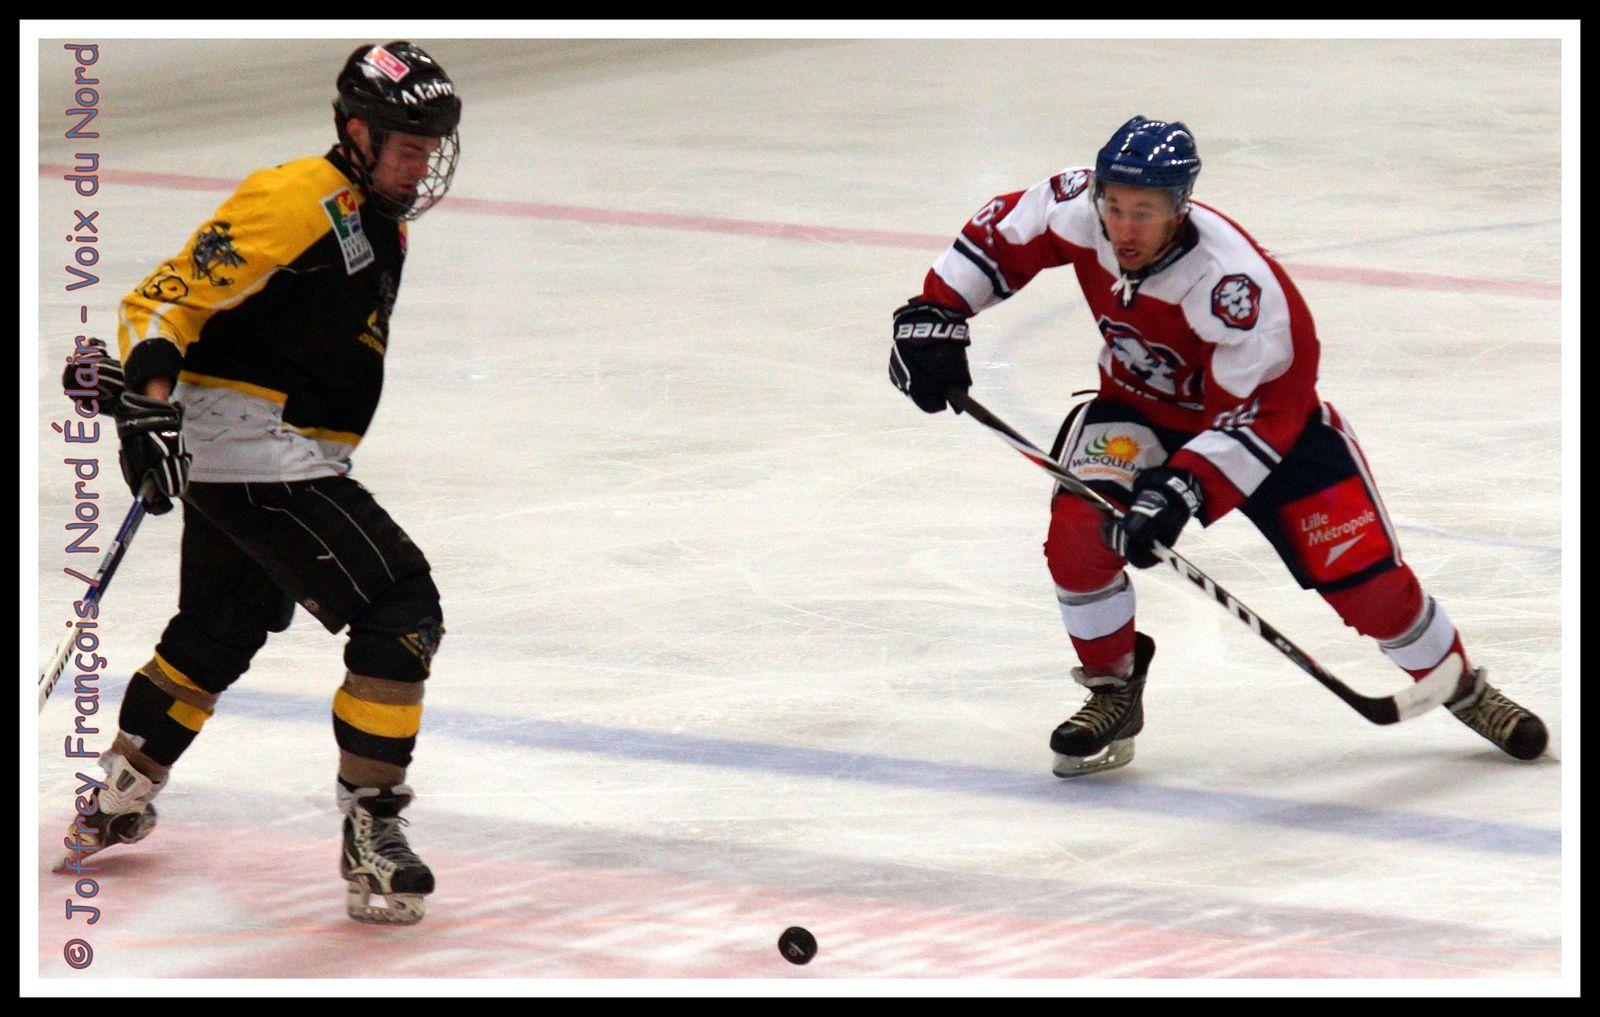 18.10.14 Hockey/glace + tennis de table